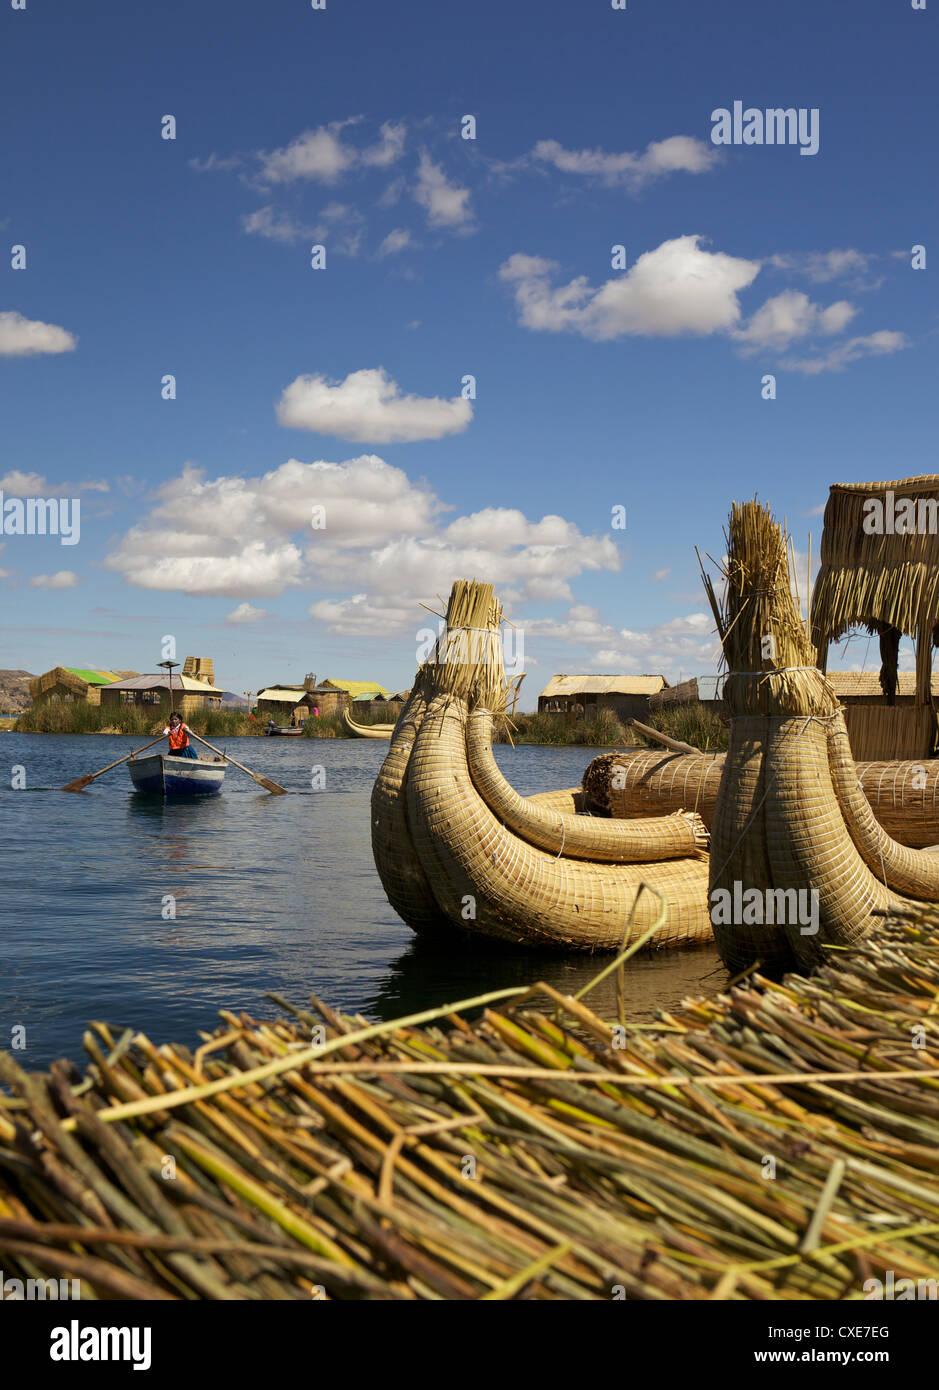 Aymara girl in a rowboat, Uros Island, Lake Titicaca, peru, South America - Stock Image